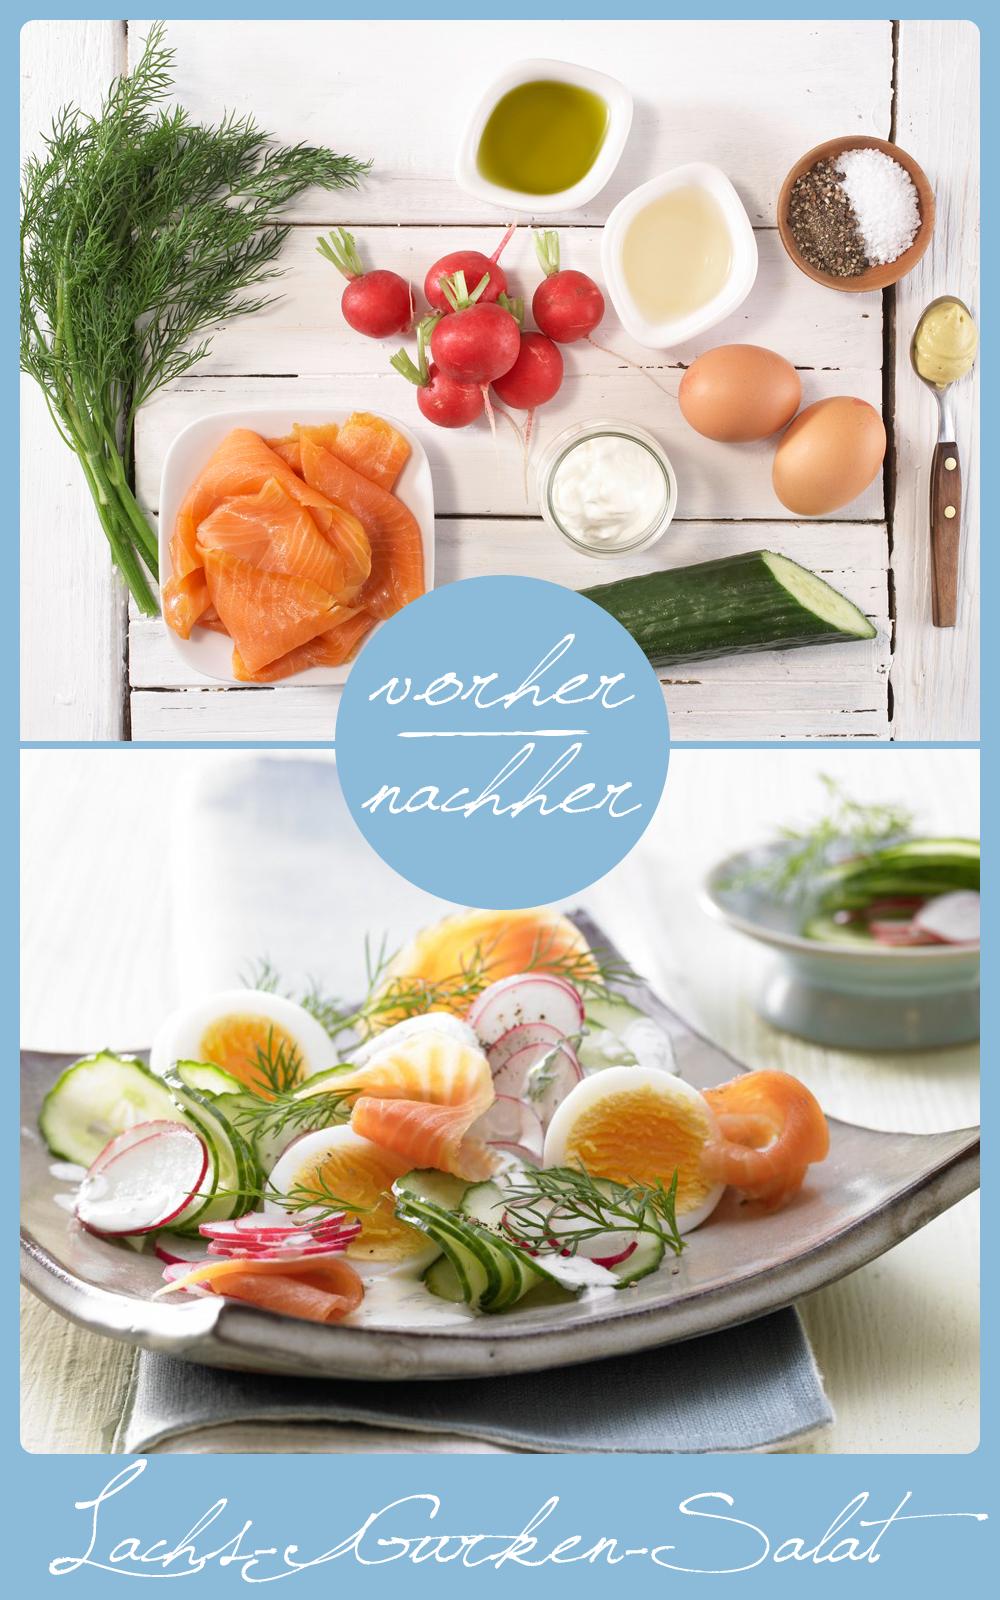 lachs gurken salat rezept eat healthy eat smarter pinterest salat essen und rezepte. Black Bedroom Furniture Sets. Home Design Ideas